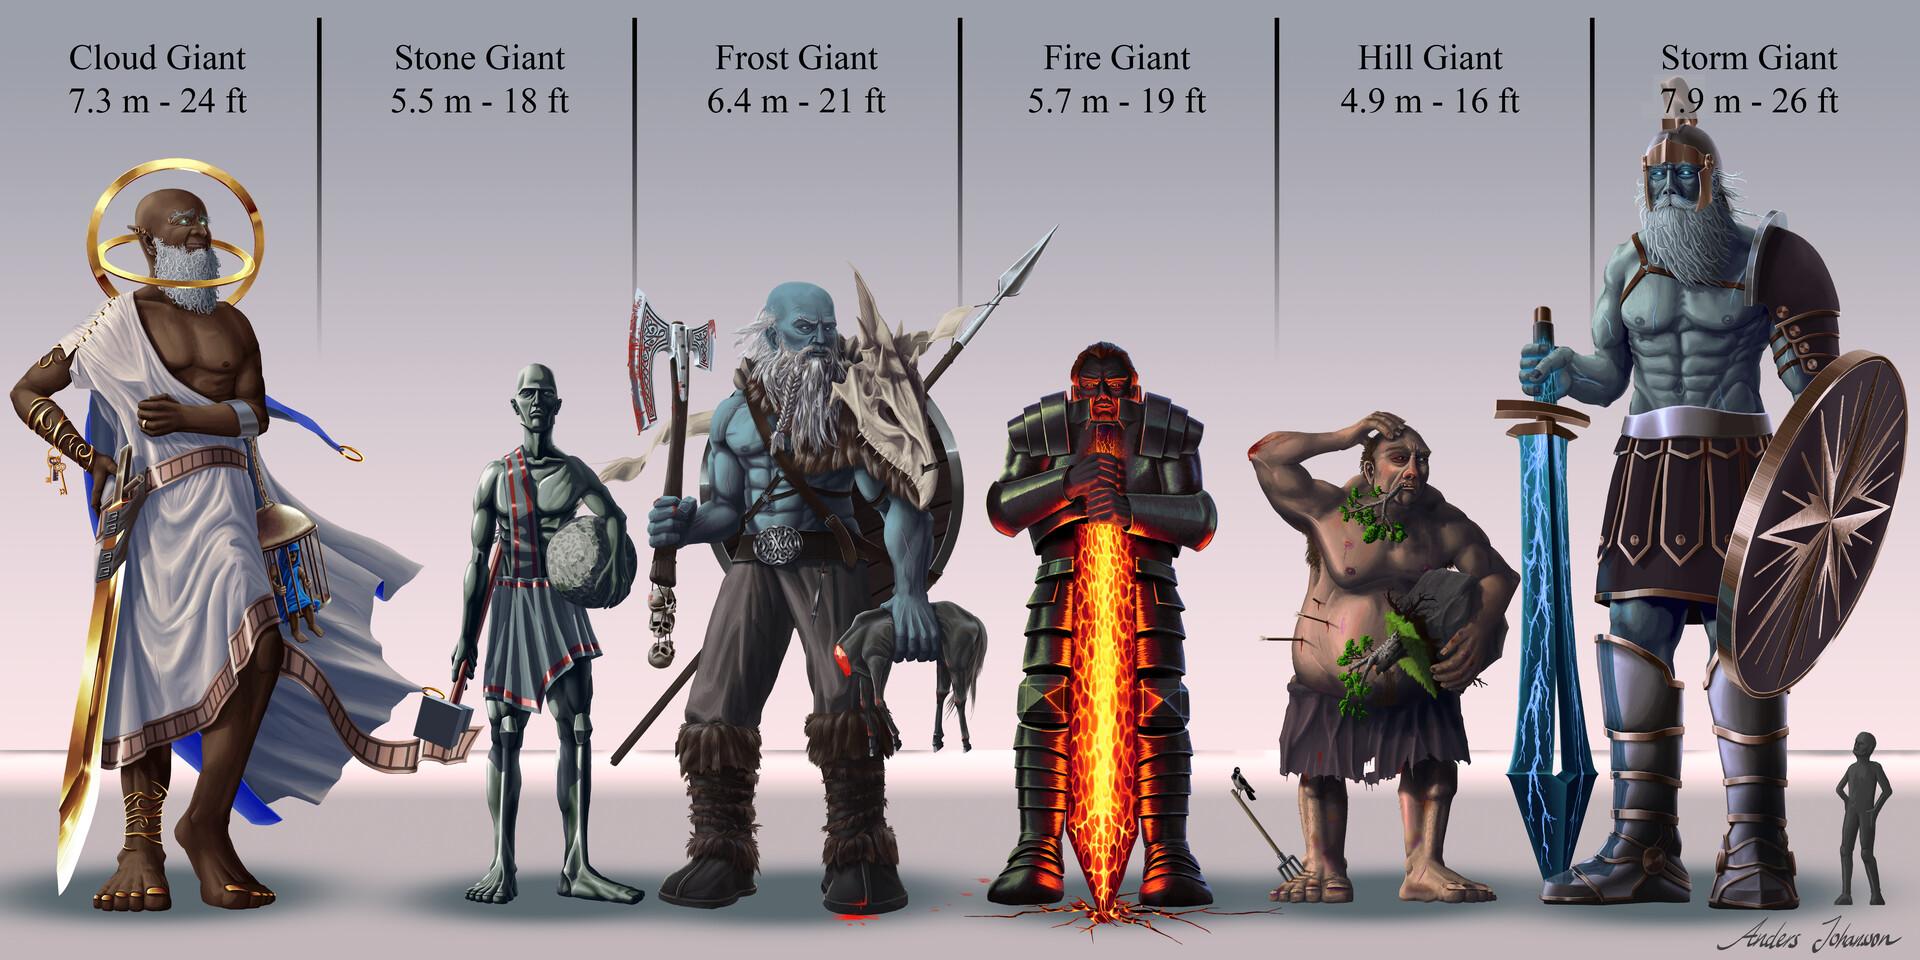 anders-johansson-giants-023.jpg